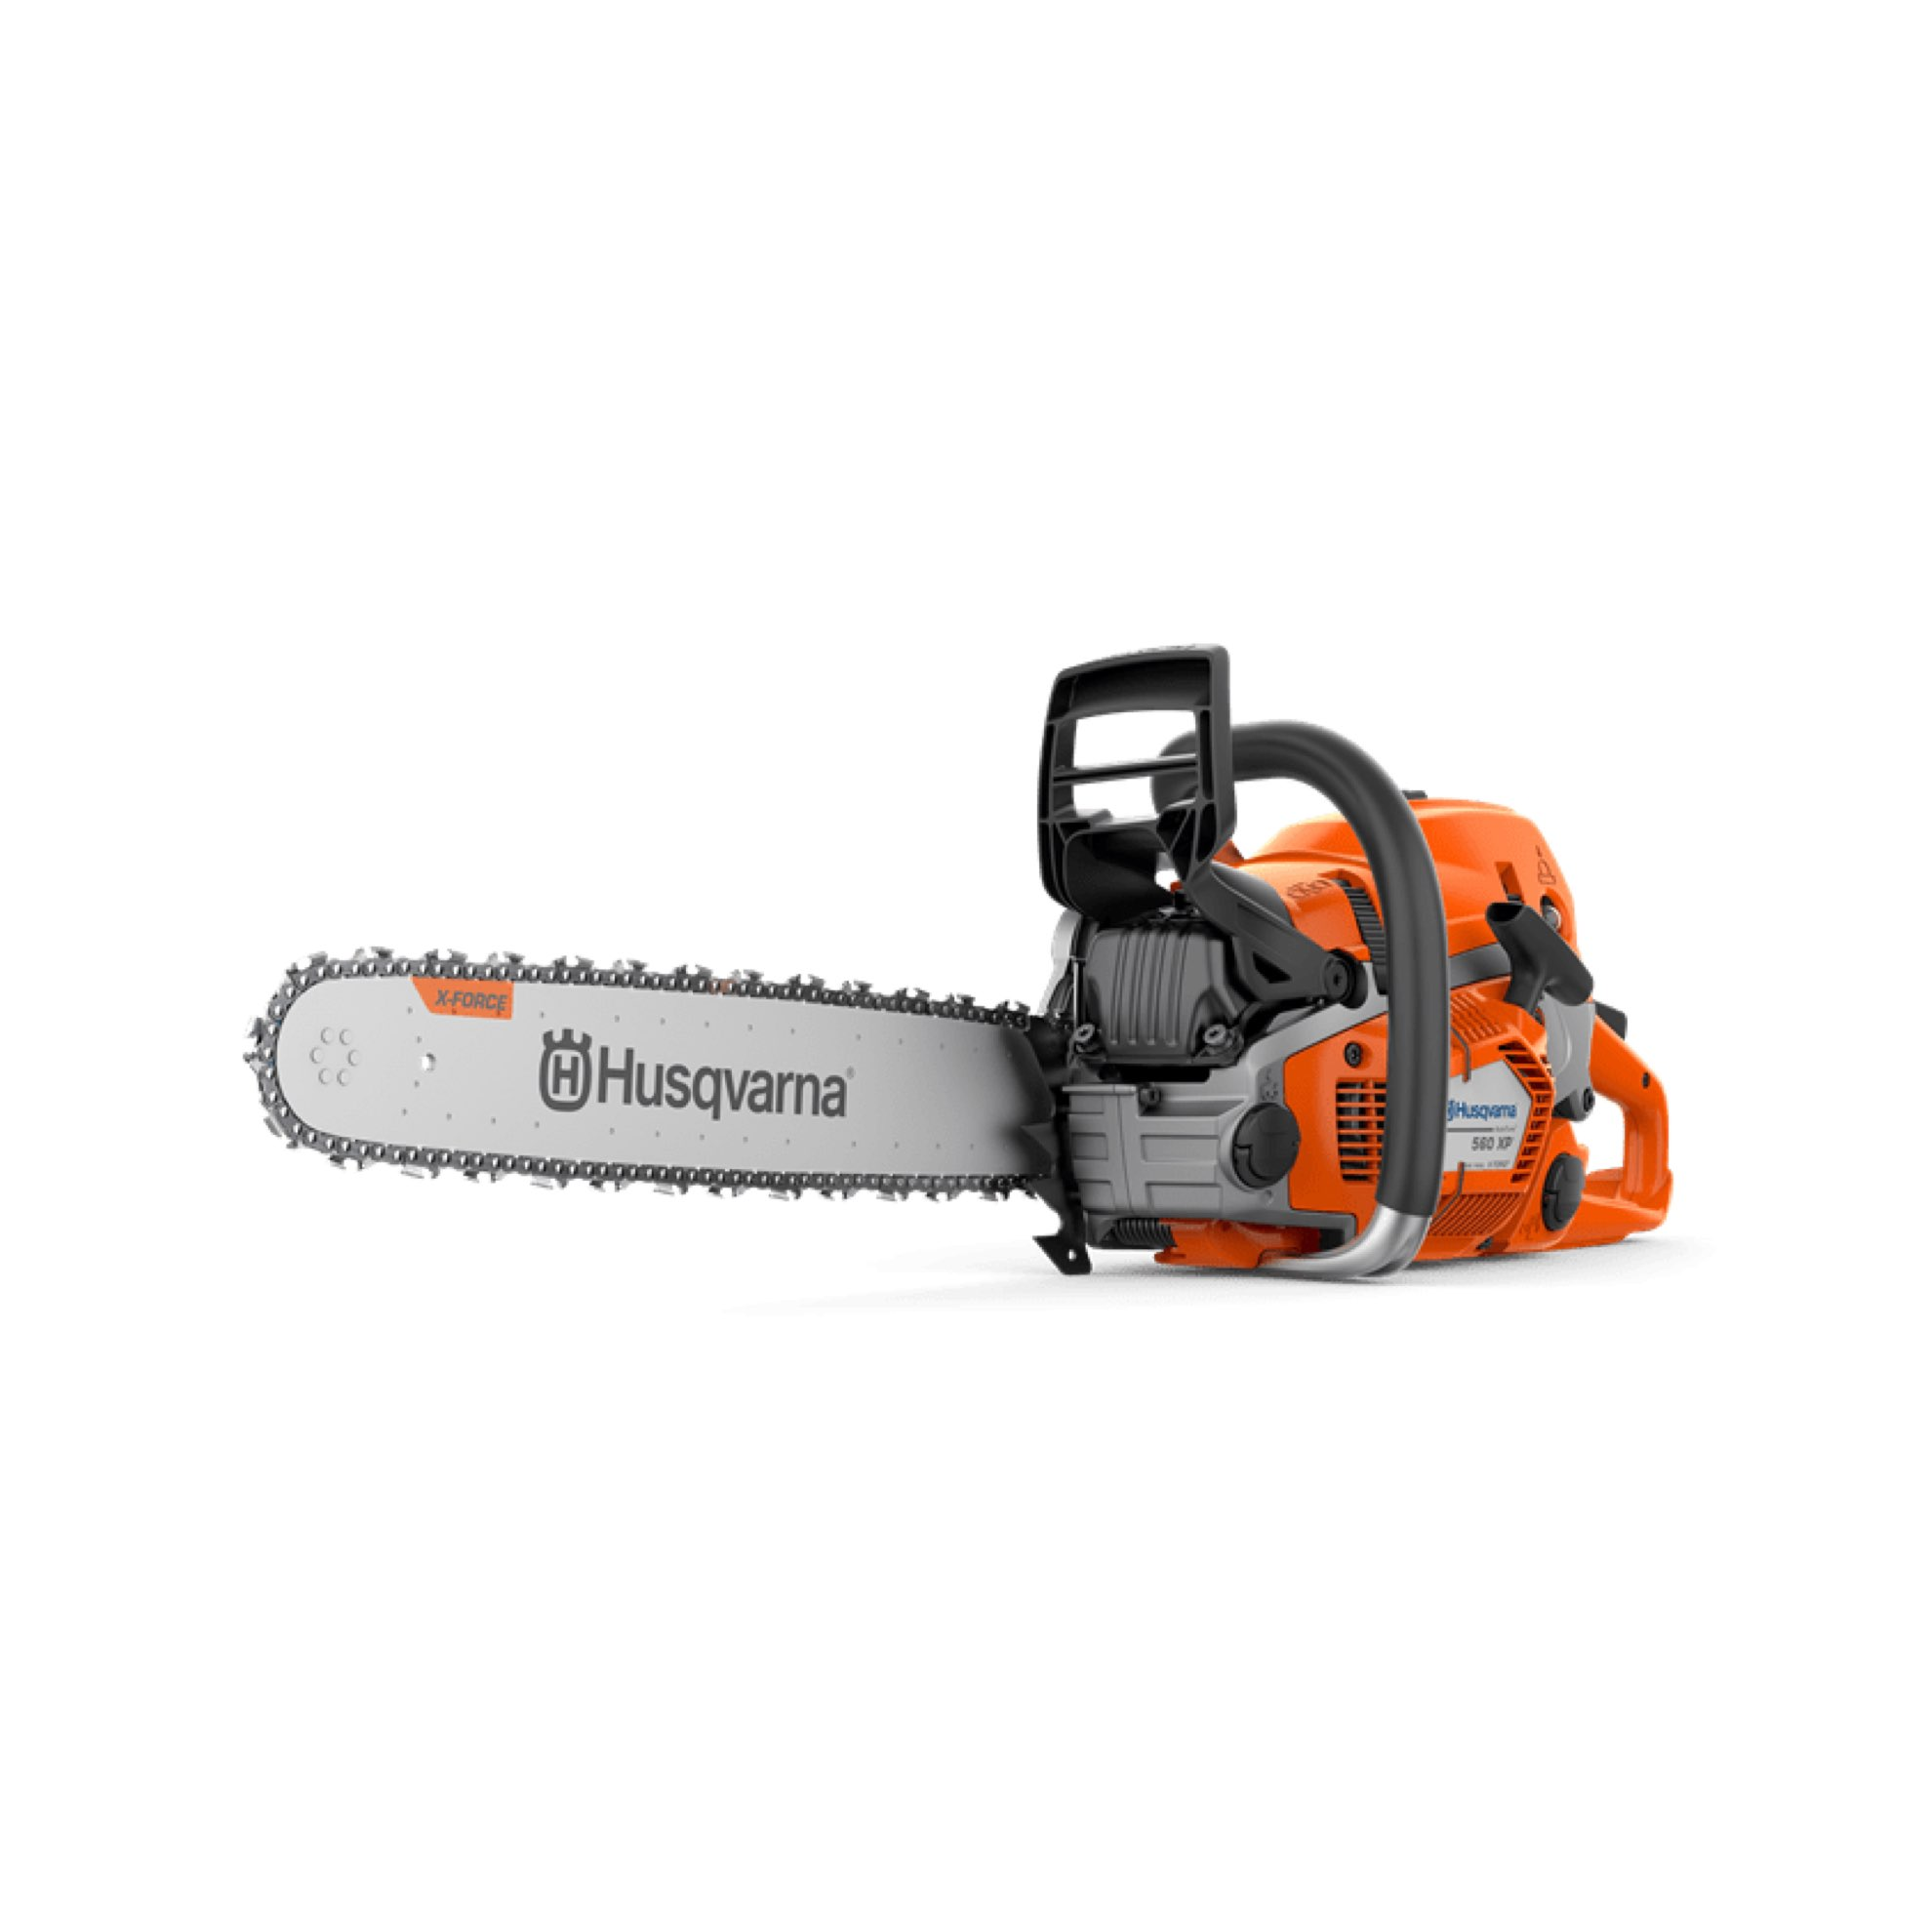 Husqvarna 560 XP® Petrol-powered Chainsaw